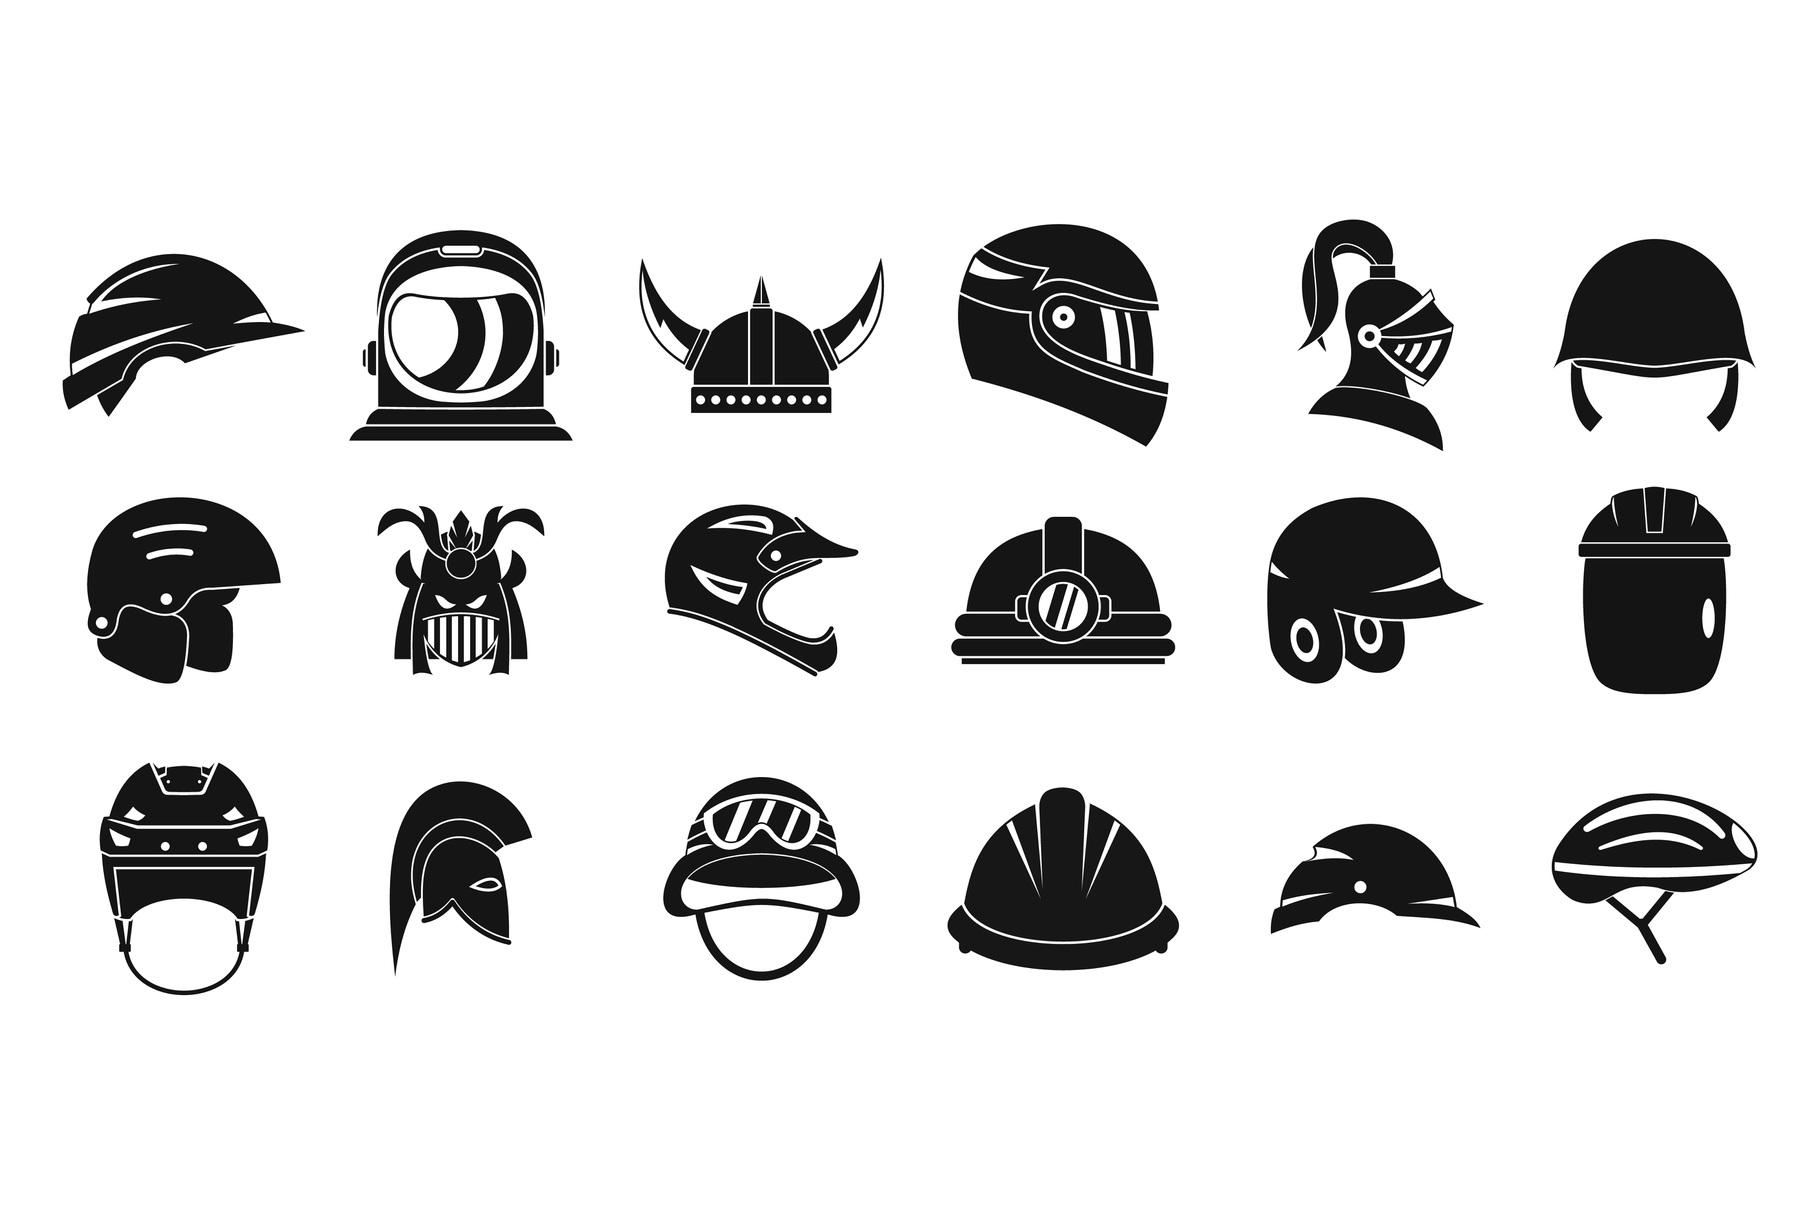 Helmet icon set, simple style example image 1